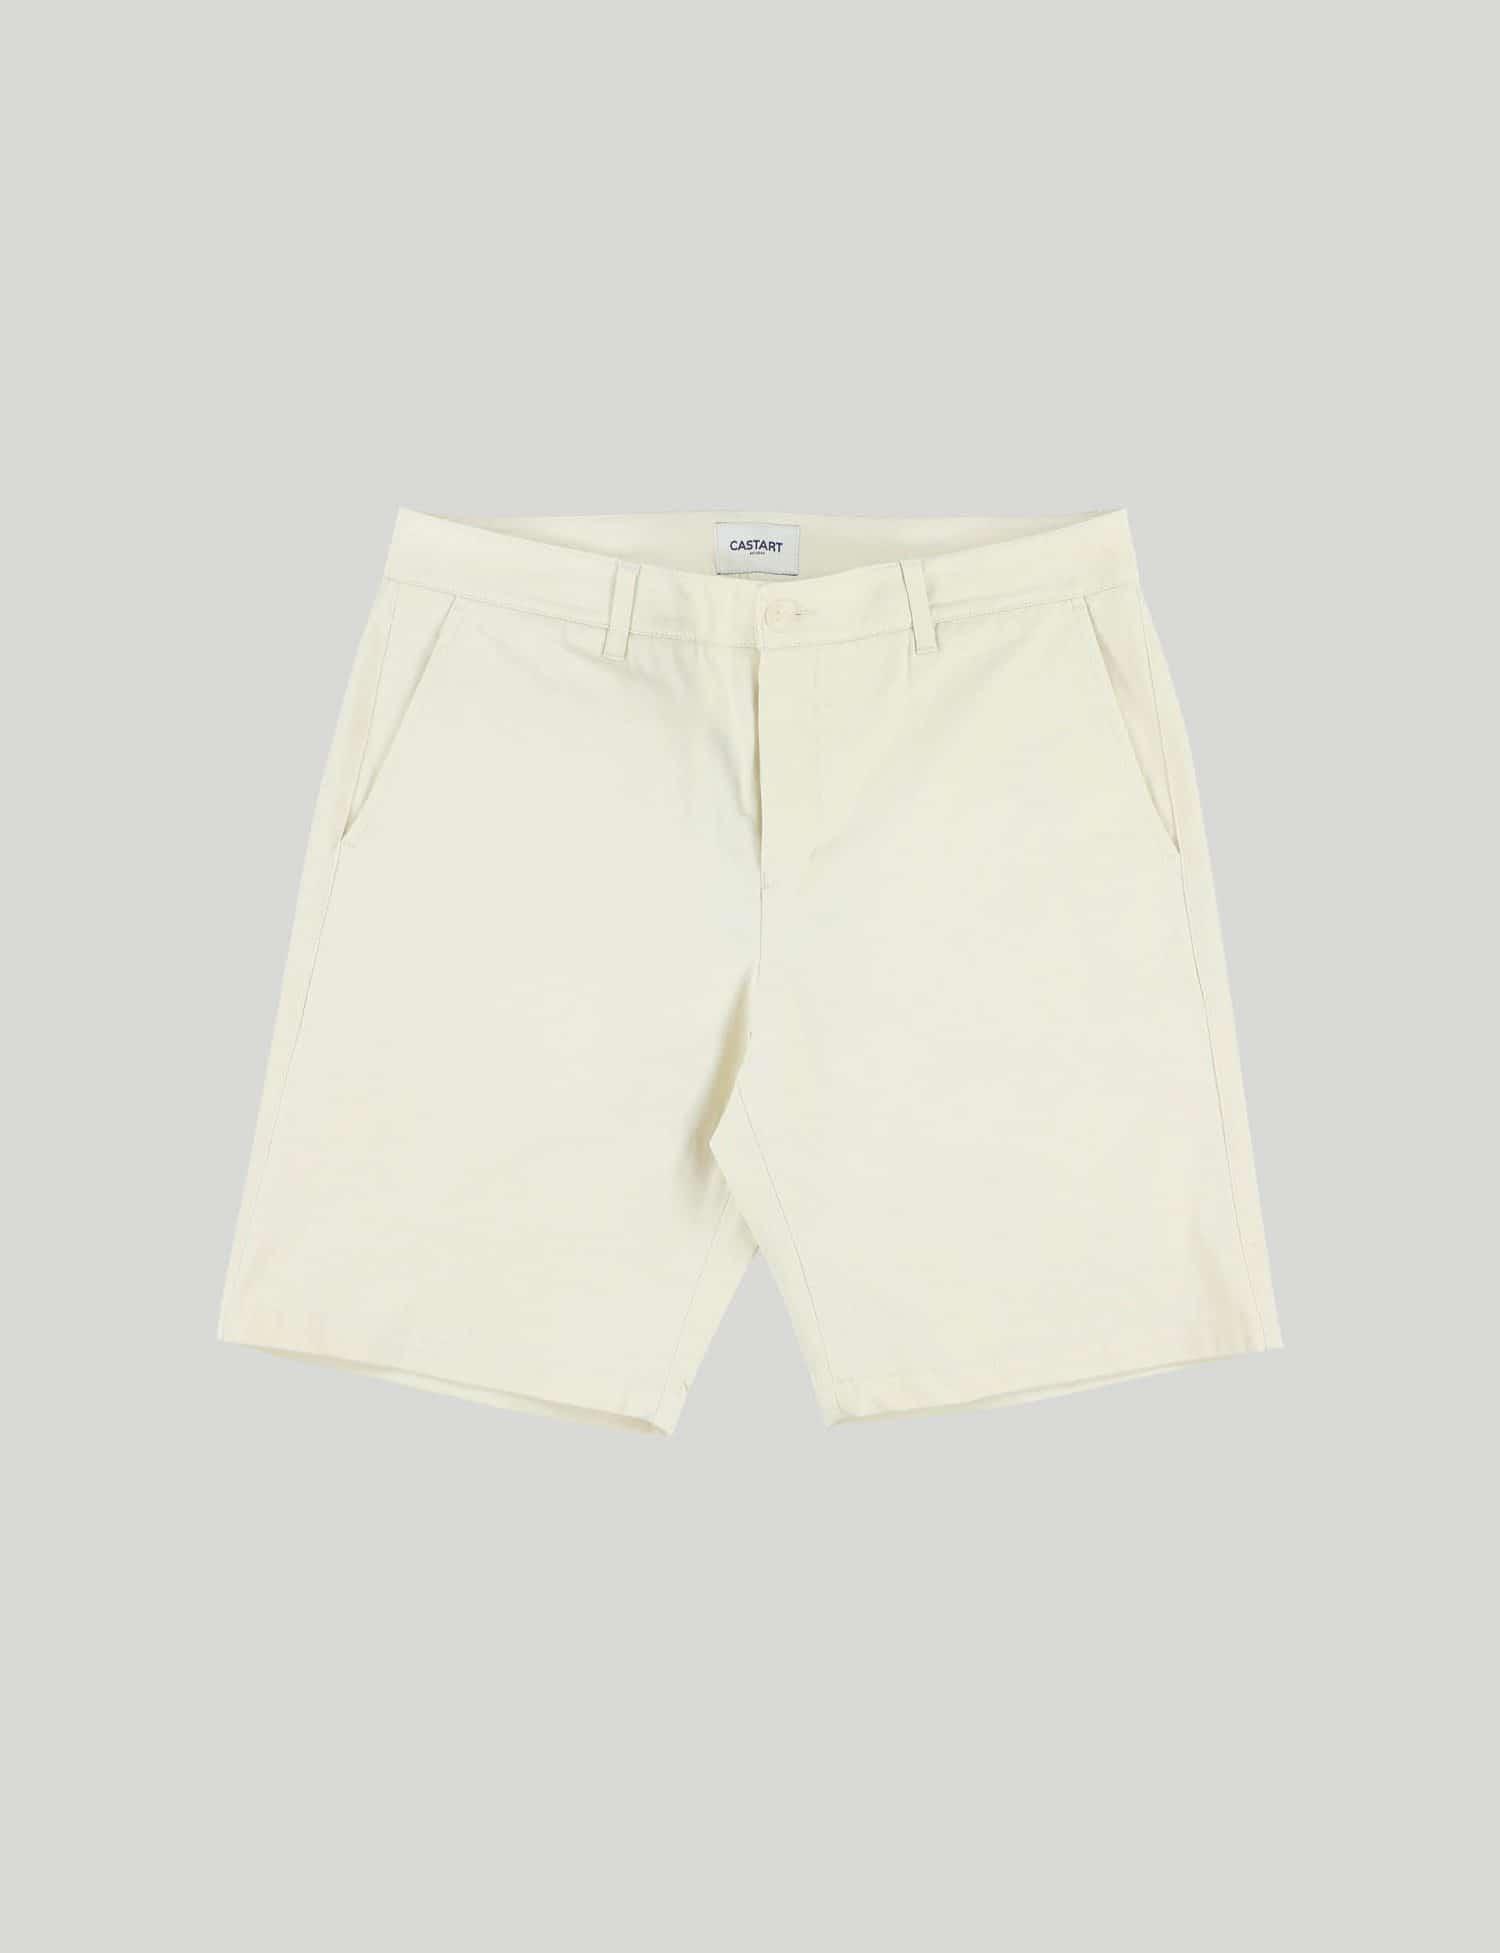 Castart - Angel Wing Shorts - Off-white